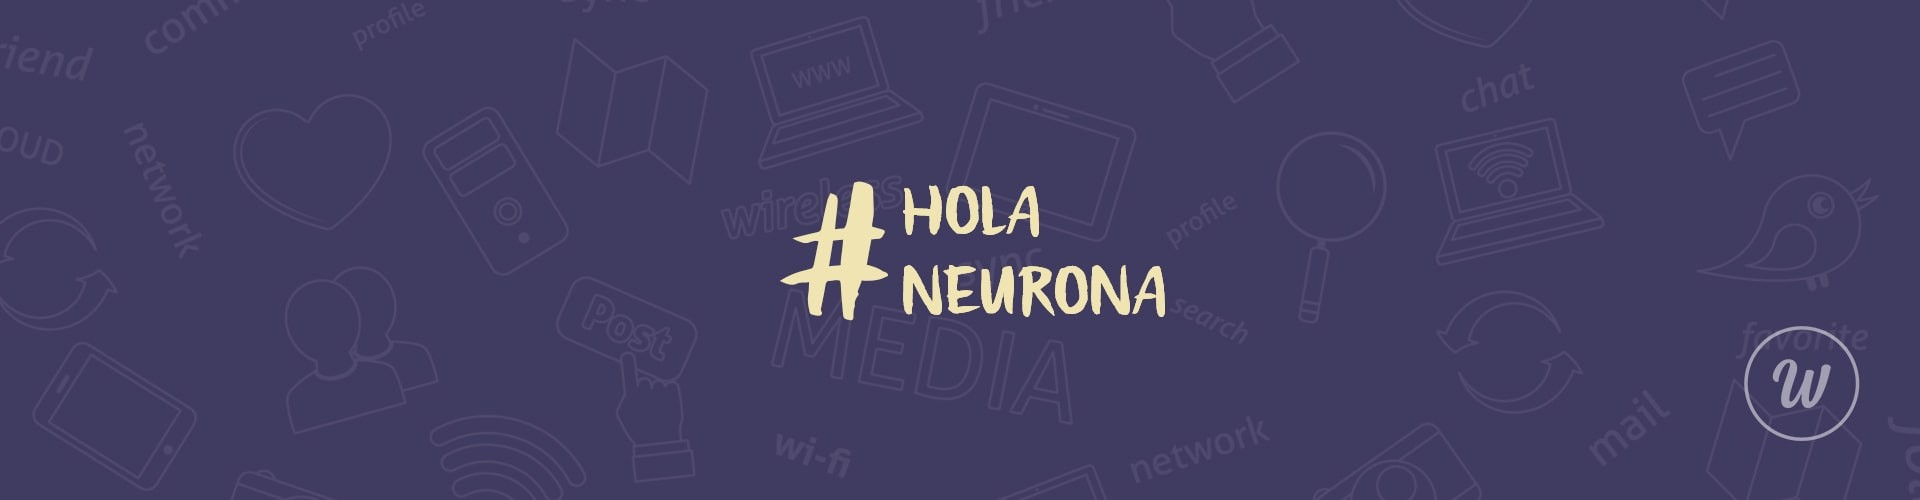 inauguracion neurona